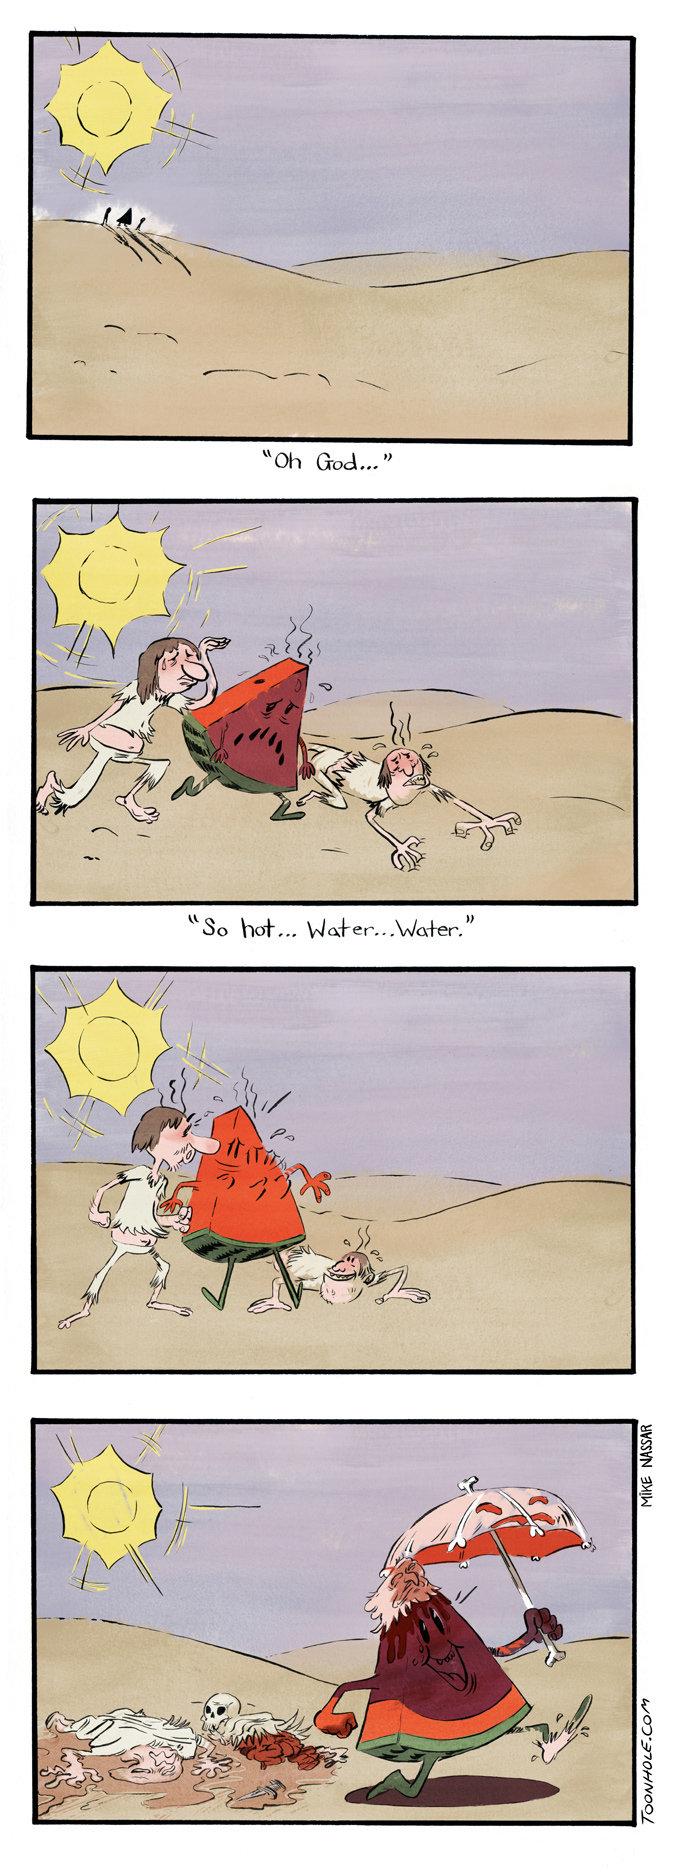 Too Hot. Another watermelon stereotype. More comics at ToonHole.com. toonhole toon cartoon comic webcomic gag watermelon TOO HOT Desert skin Umbrella